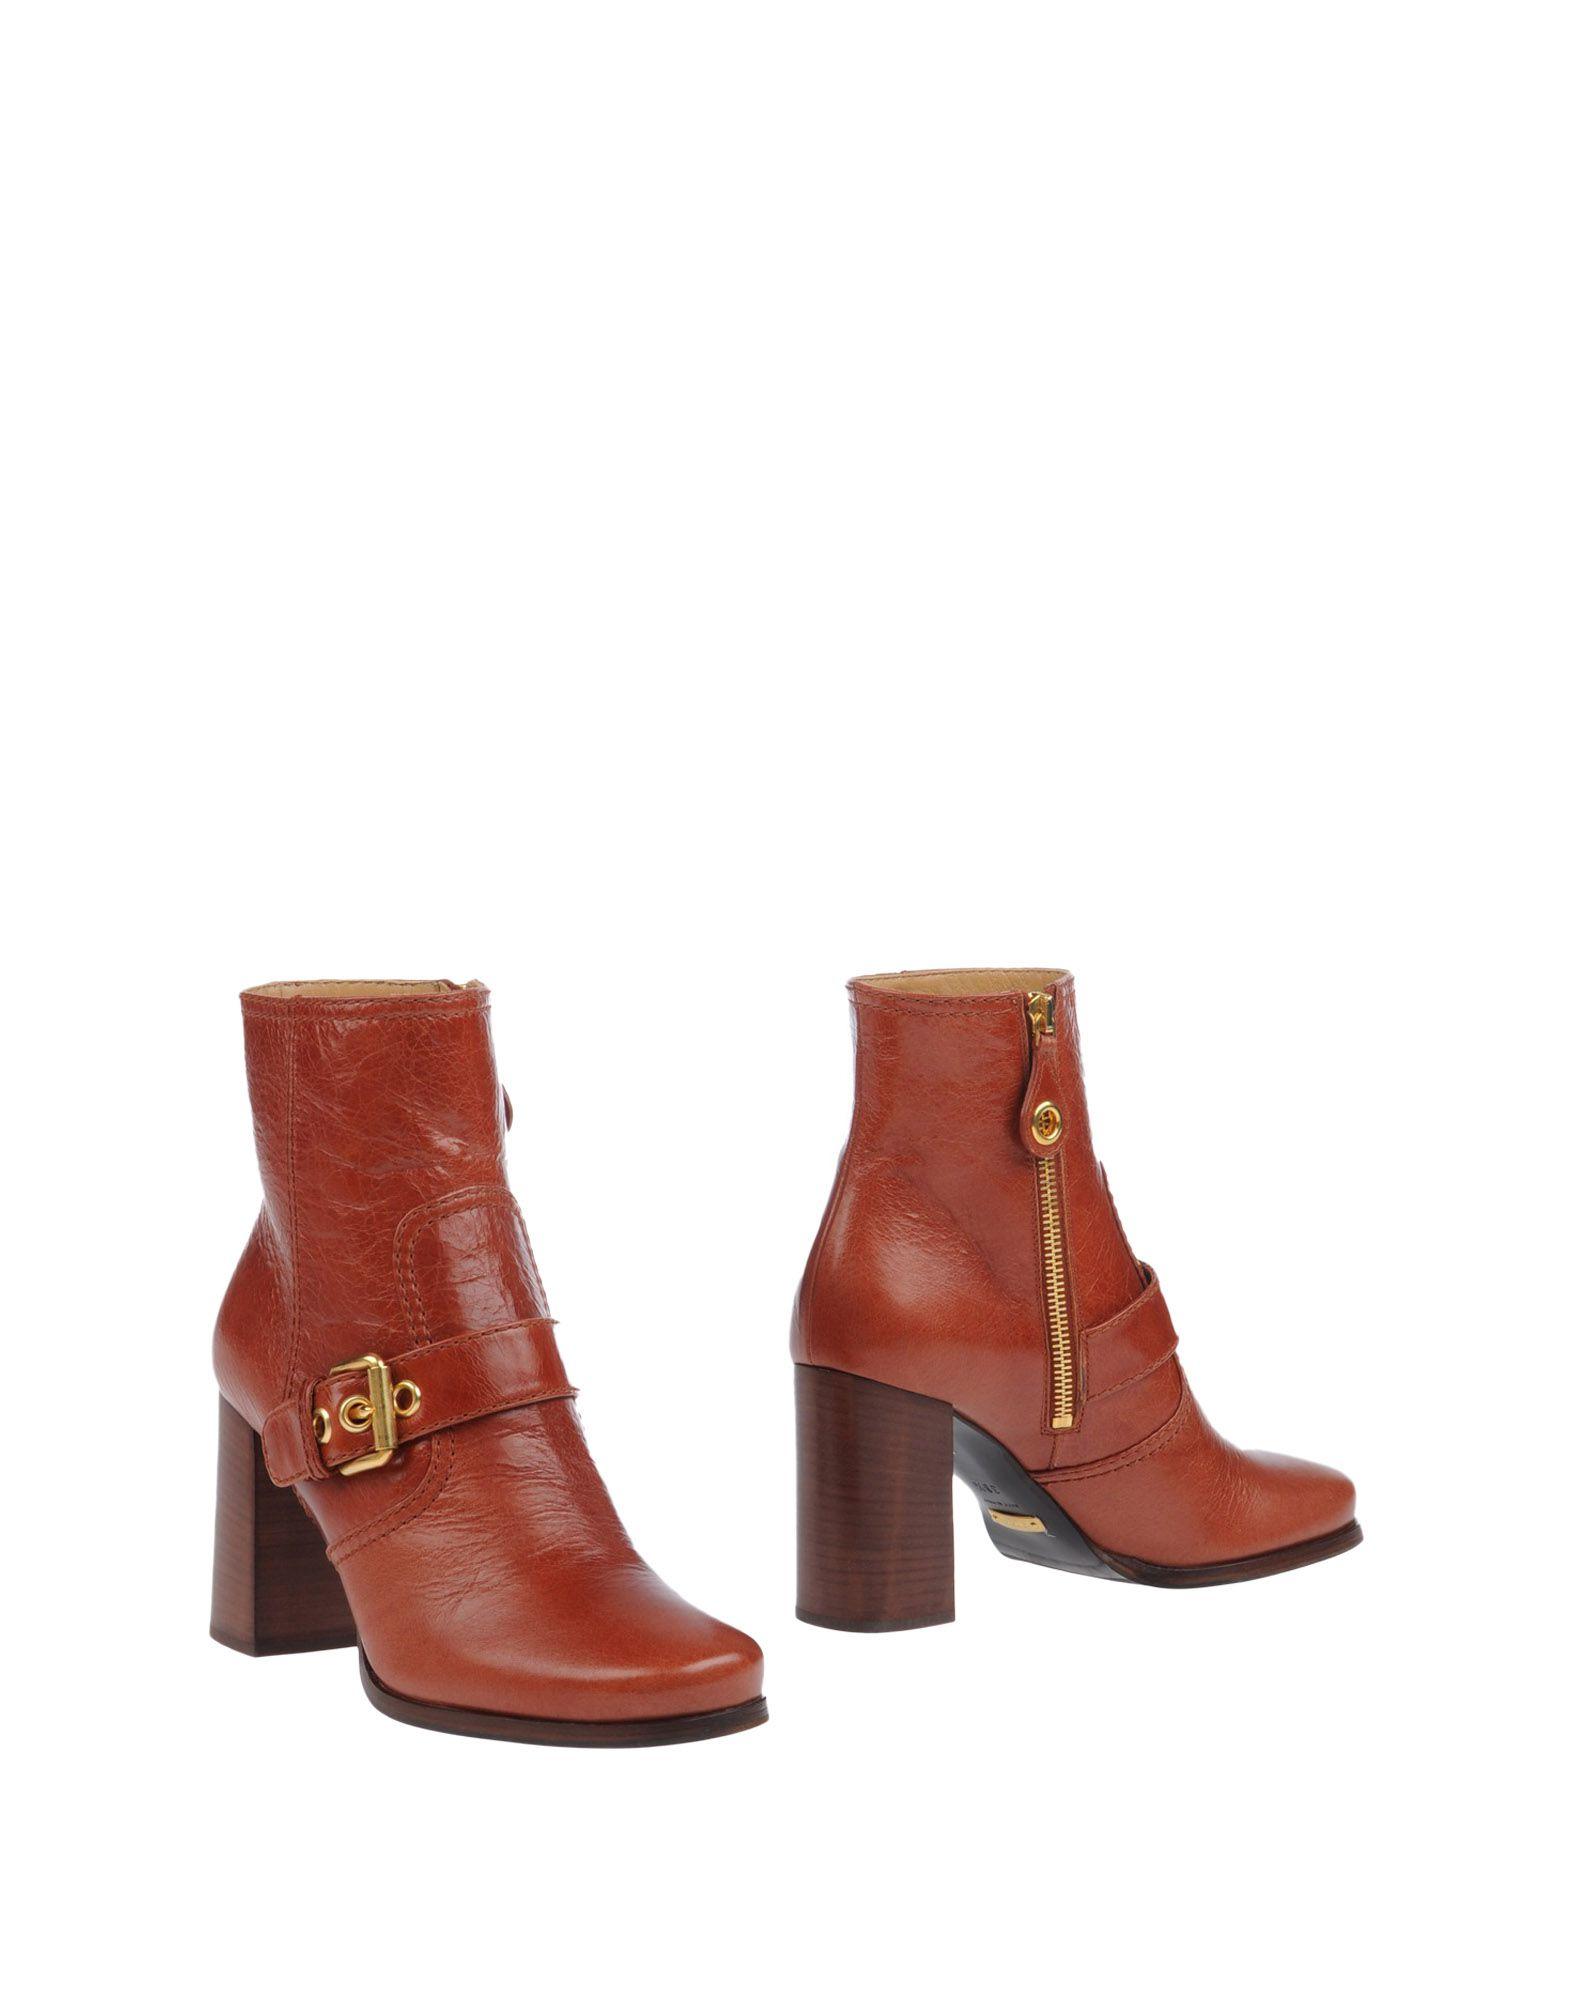 Фото - CARSHOE Полусапоги и высокие ботинки opp france полусапоги и высокие ботинки